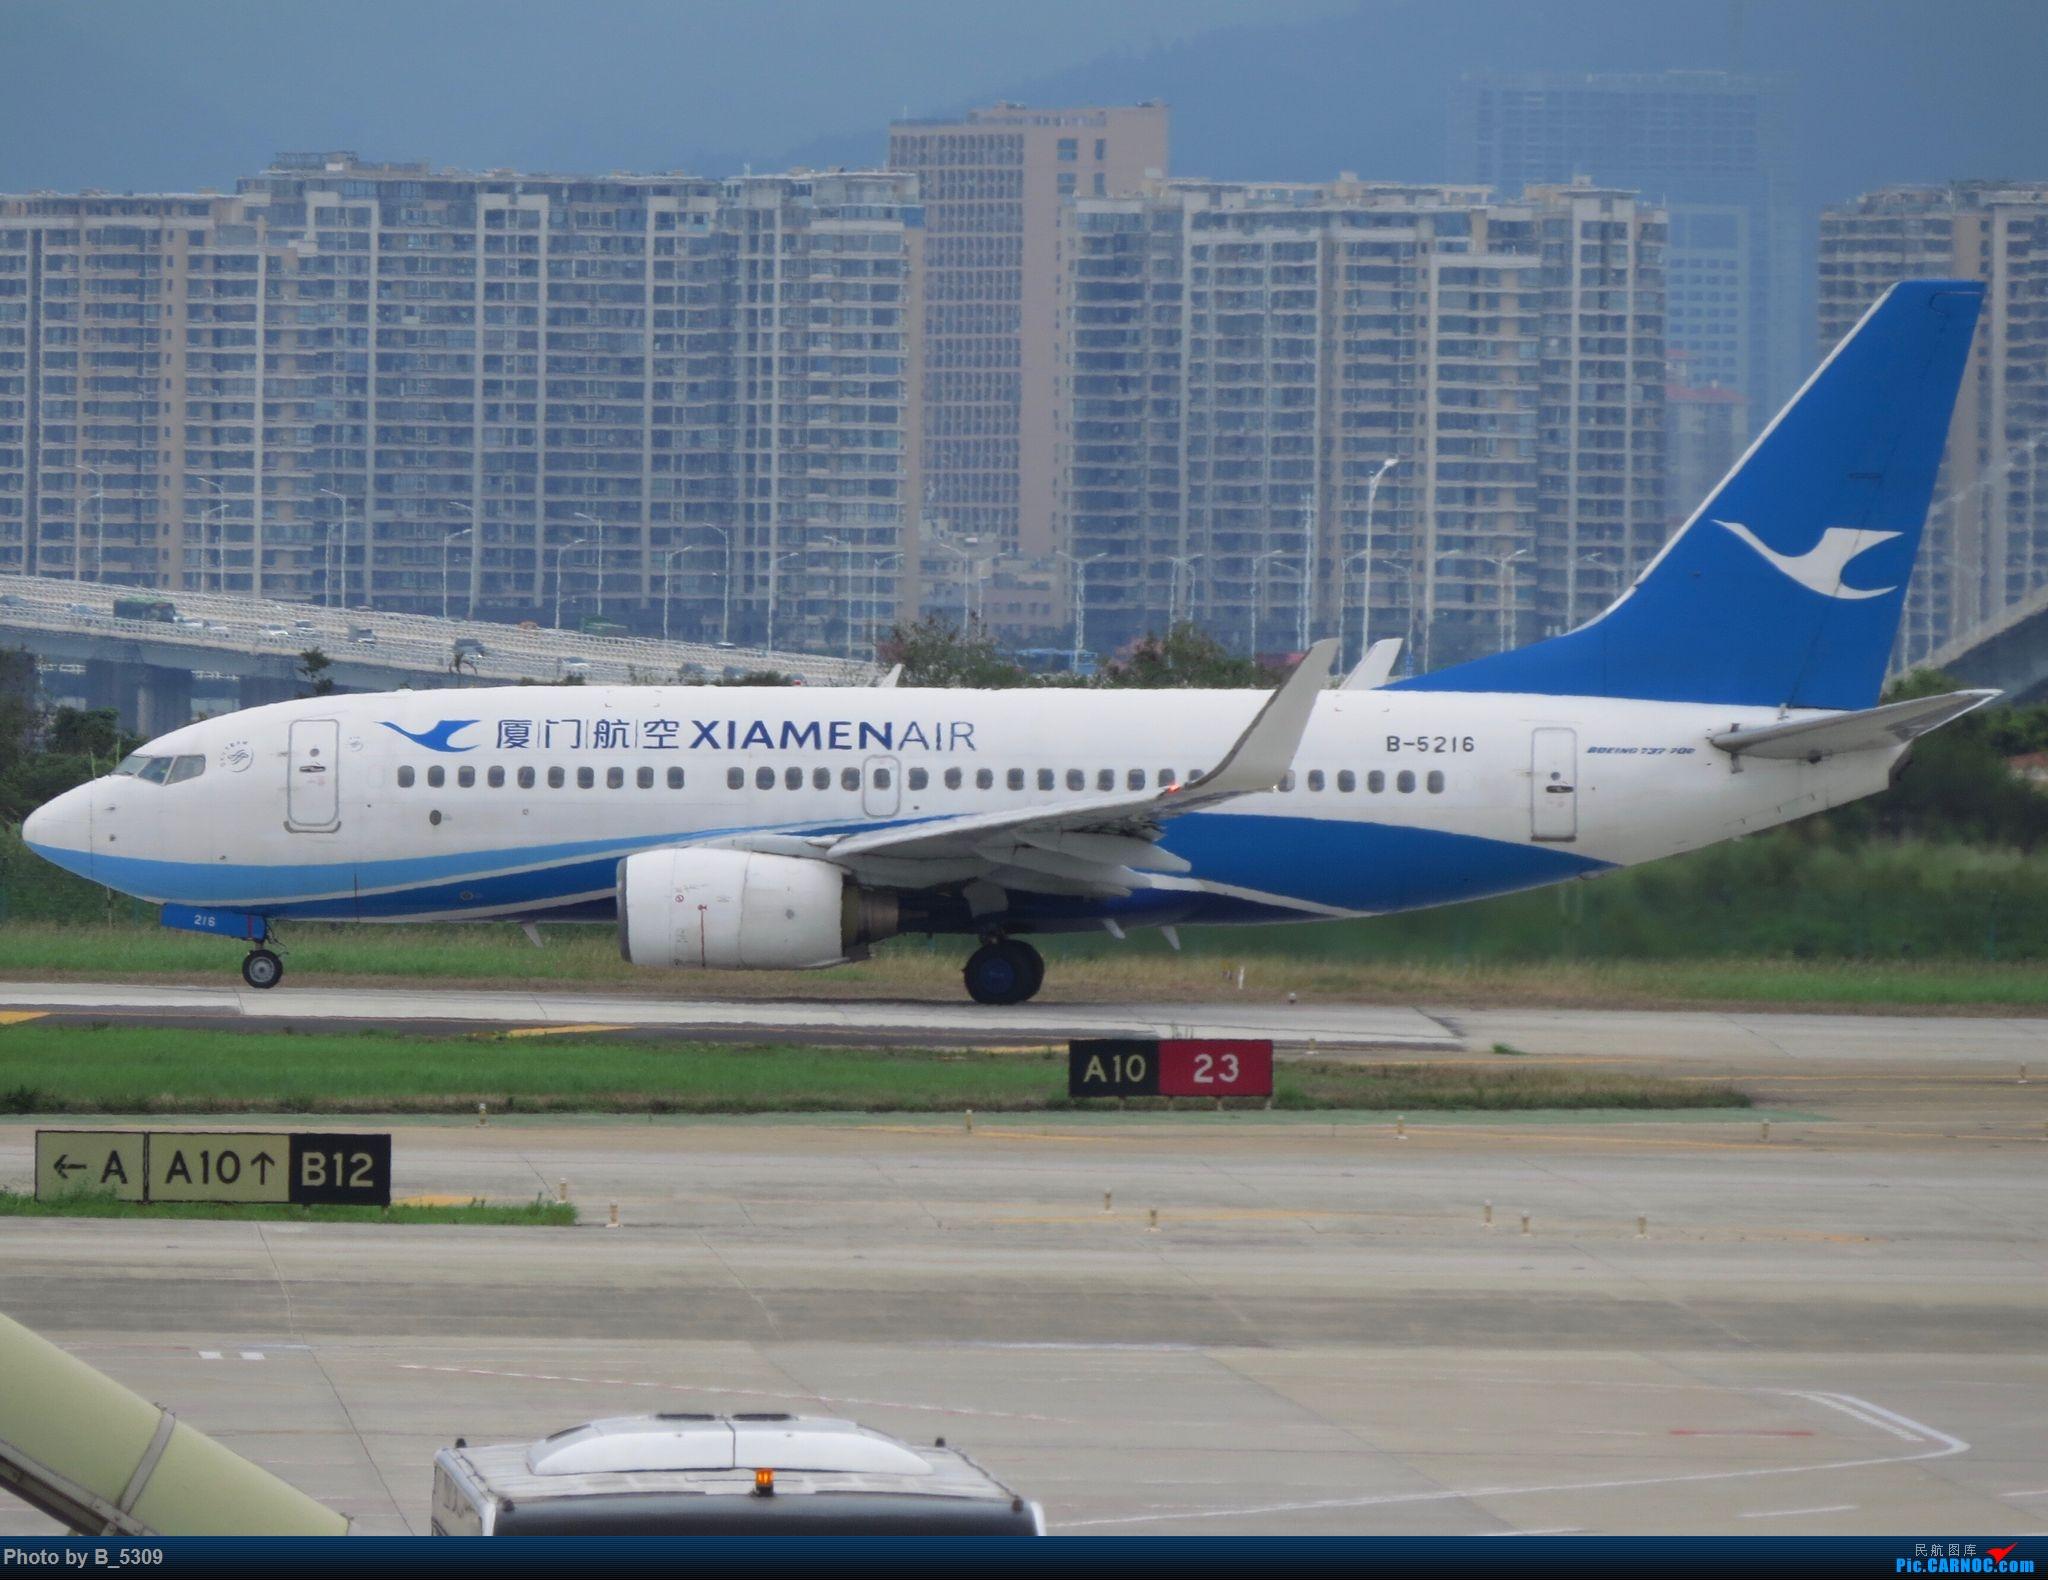 Re:[原创]复课一个月了,终于能在紧张的学习生活中抽出点时间拍稽~ BOEING 737-700 B-5216 中国厦门高崎国际机场